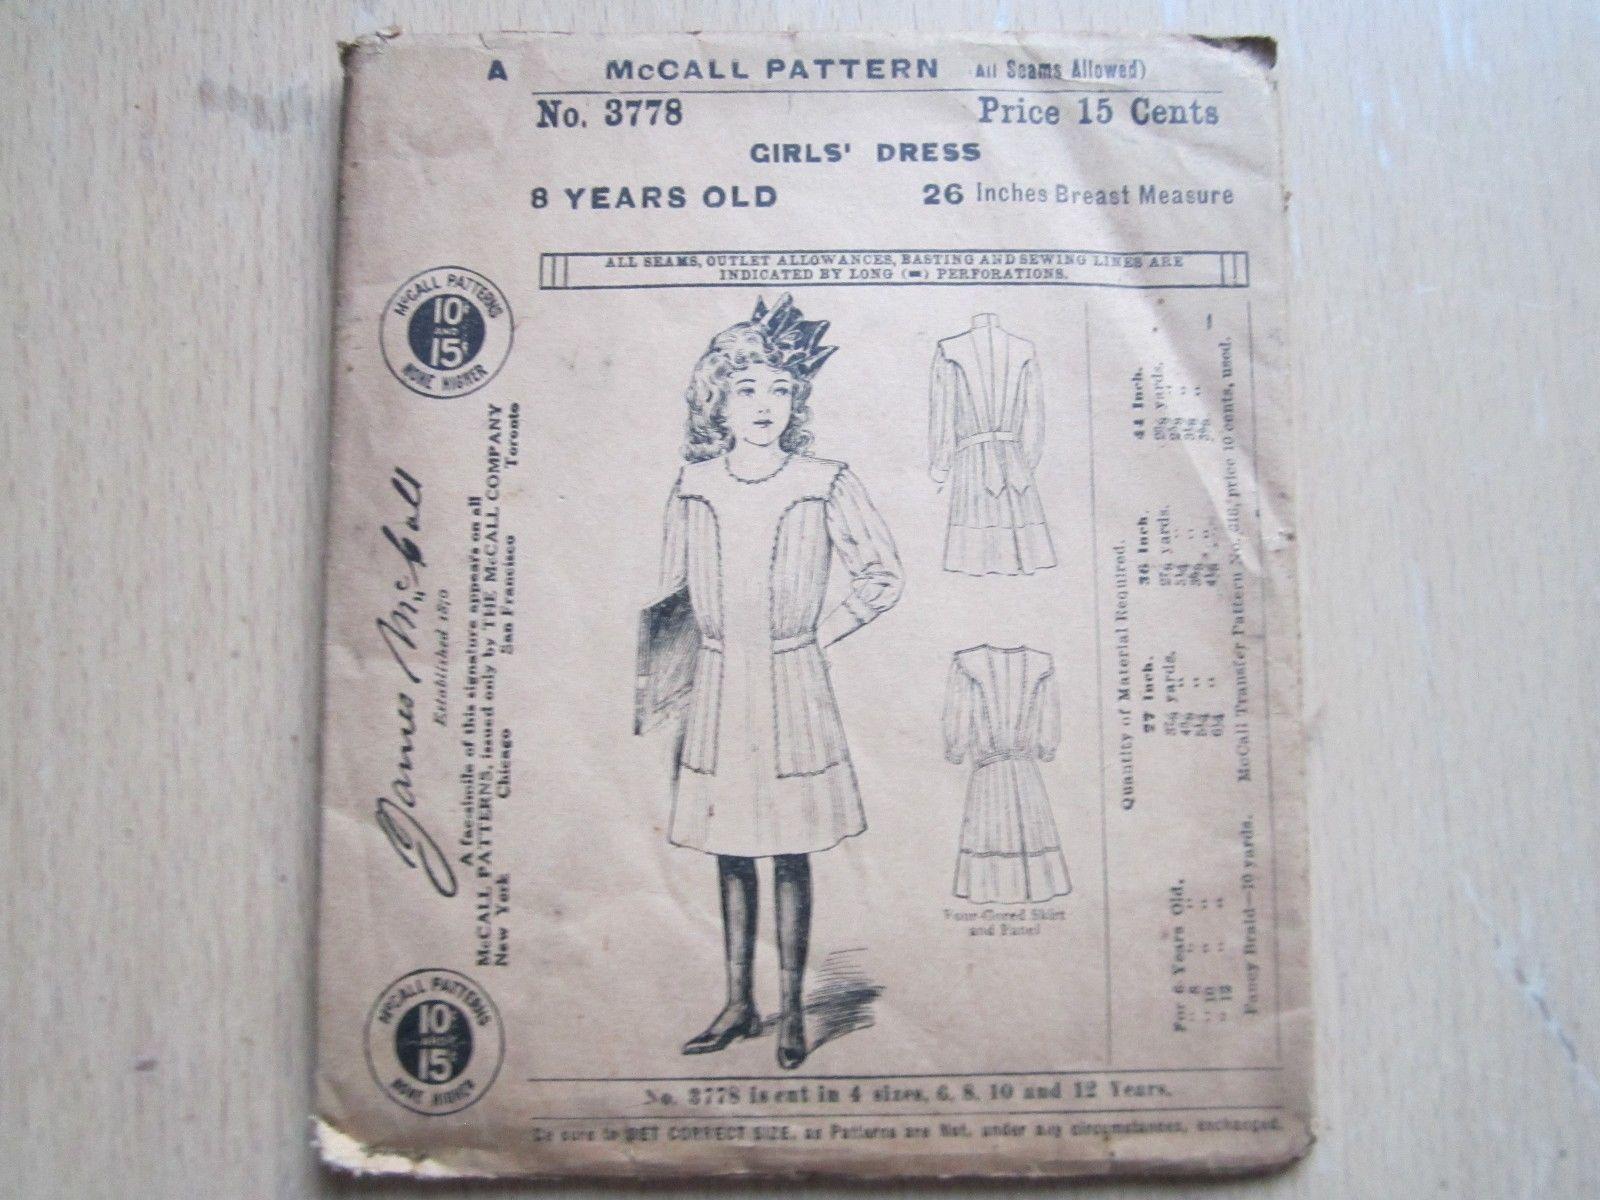 Antique vintage mccall girls dress pattern us ebay sew